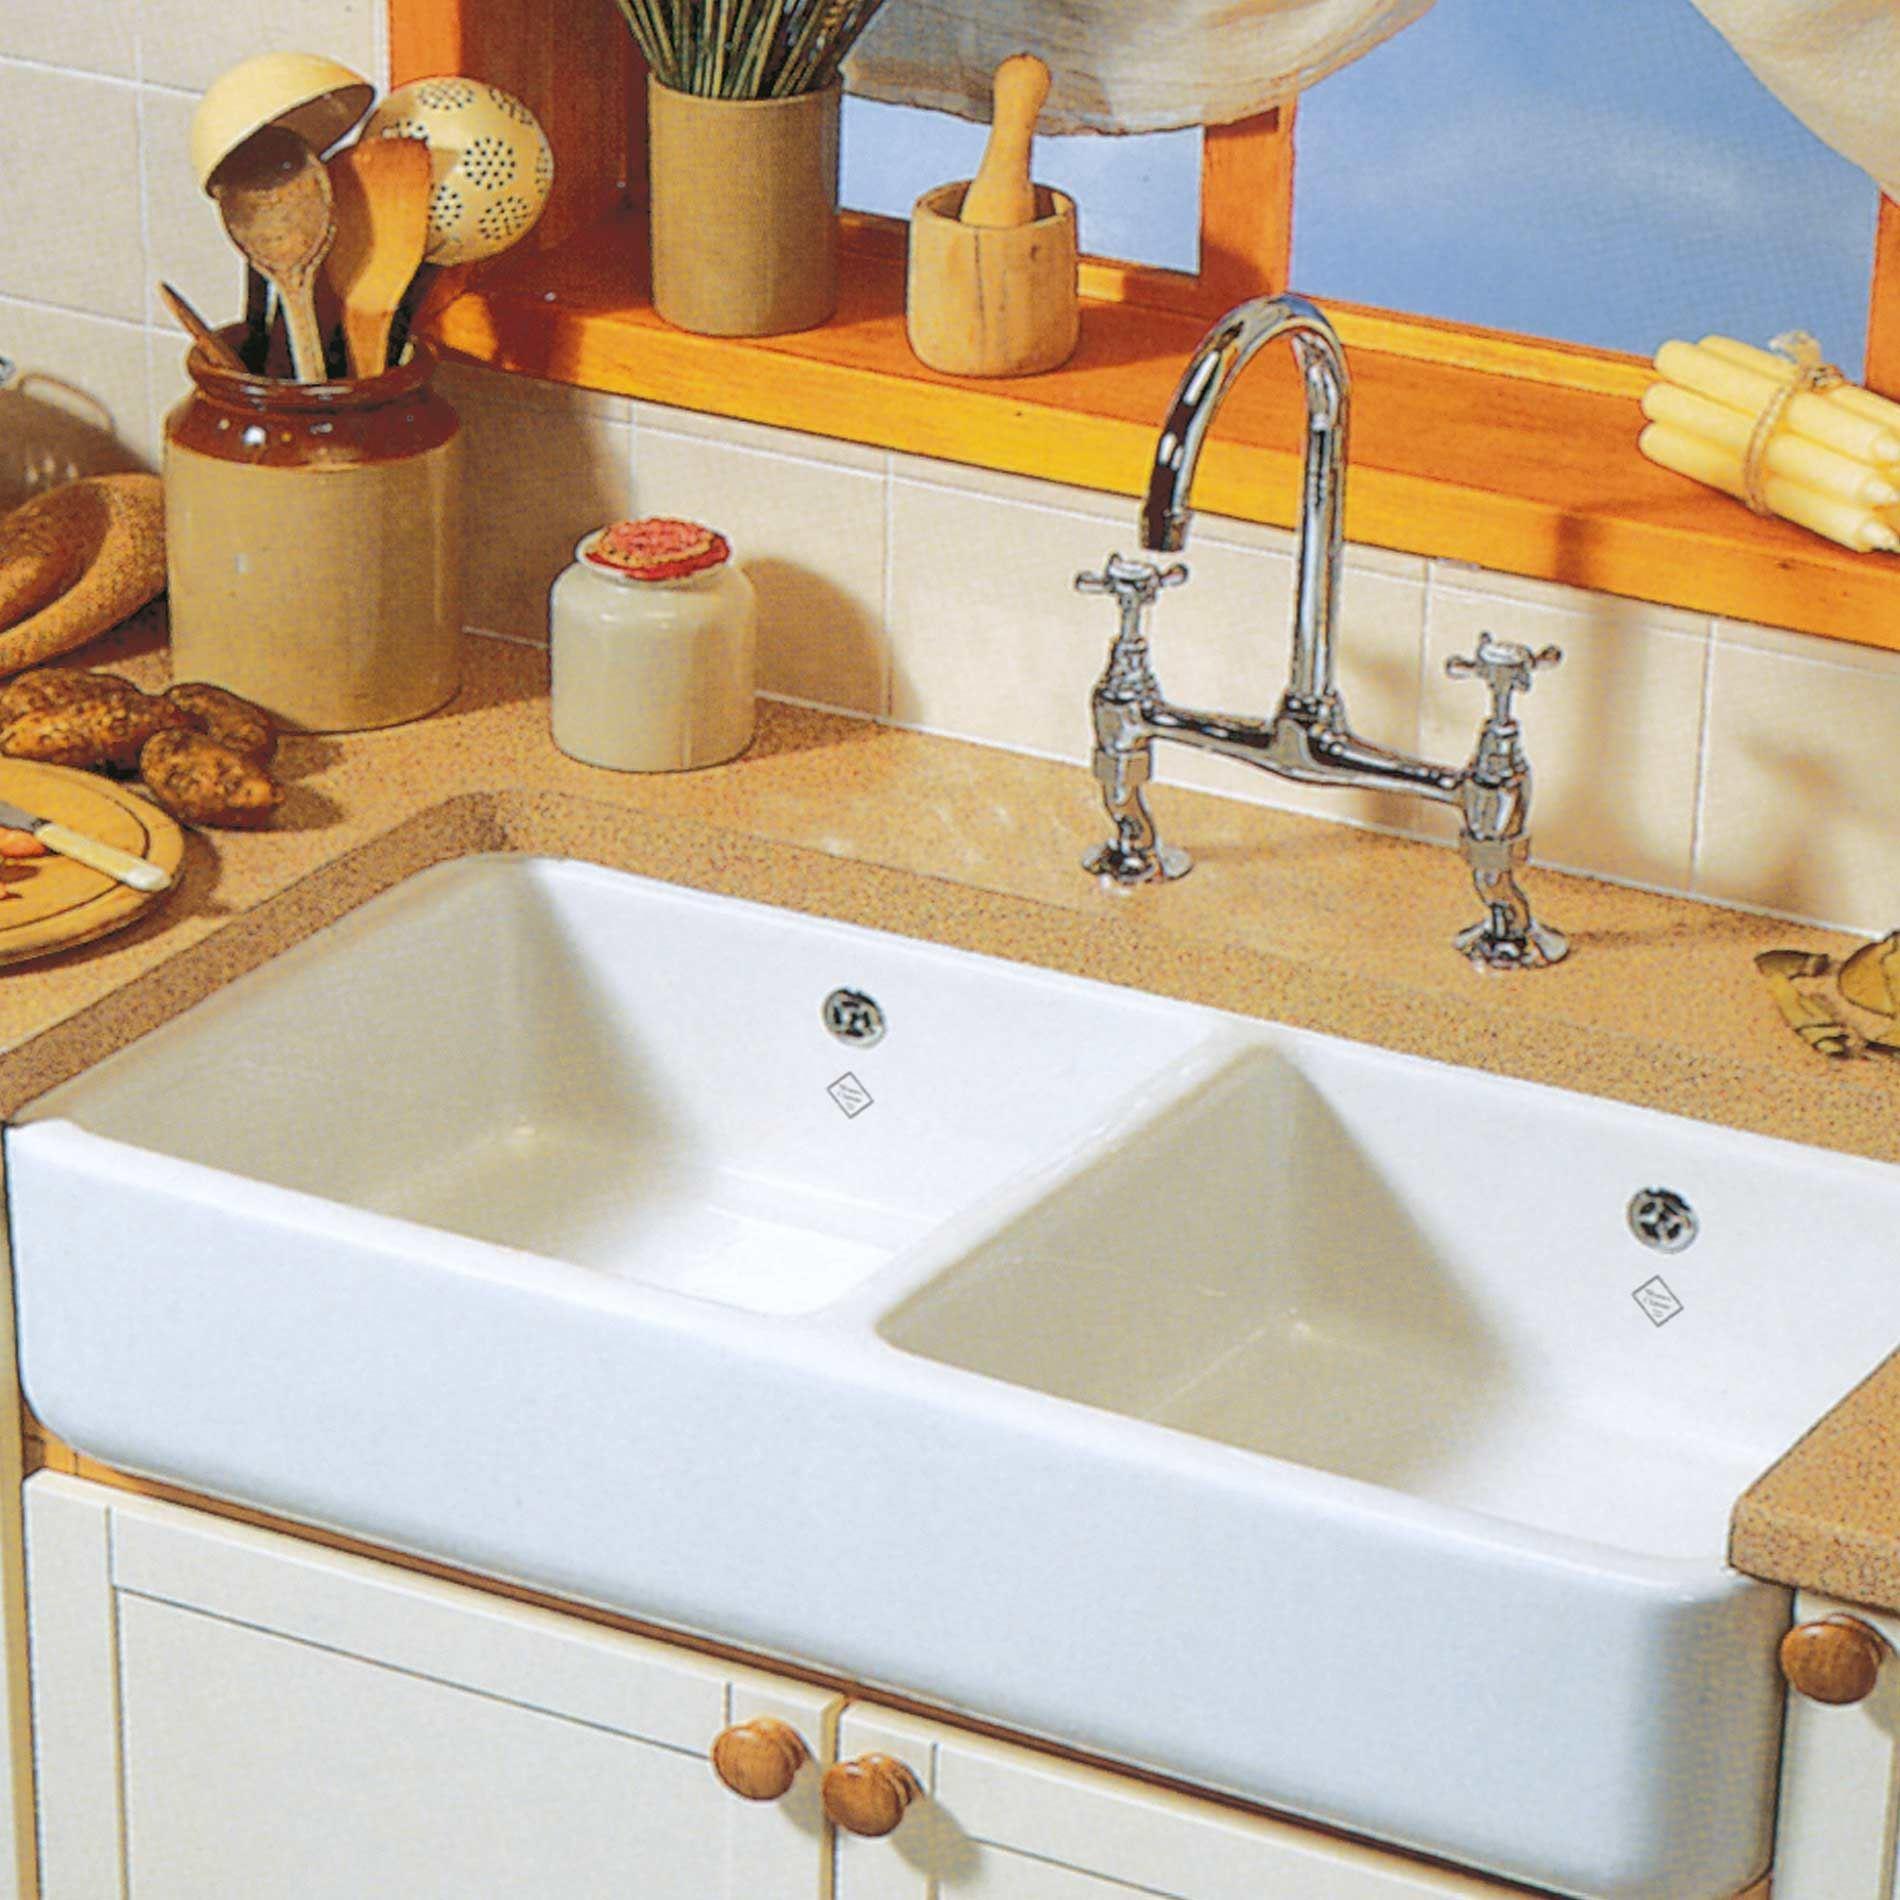 Ceramic Kitchen Taps